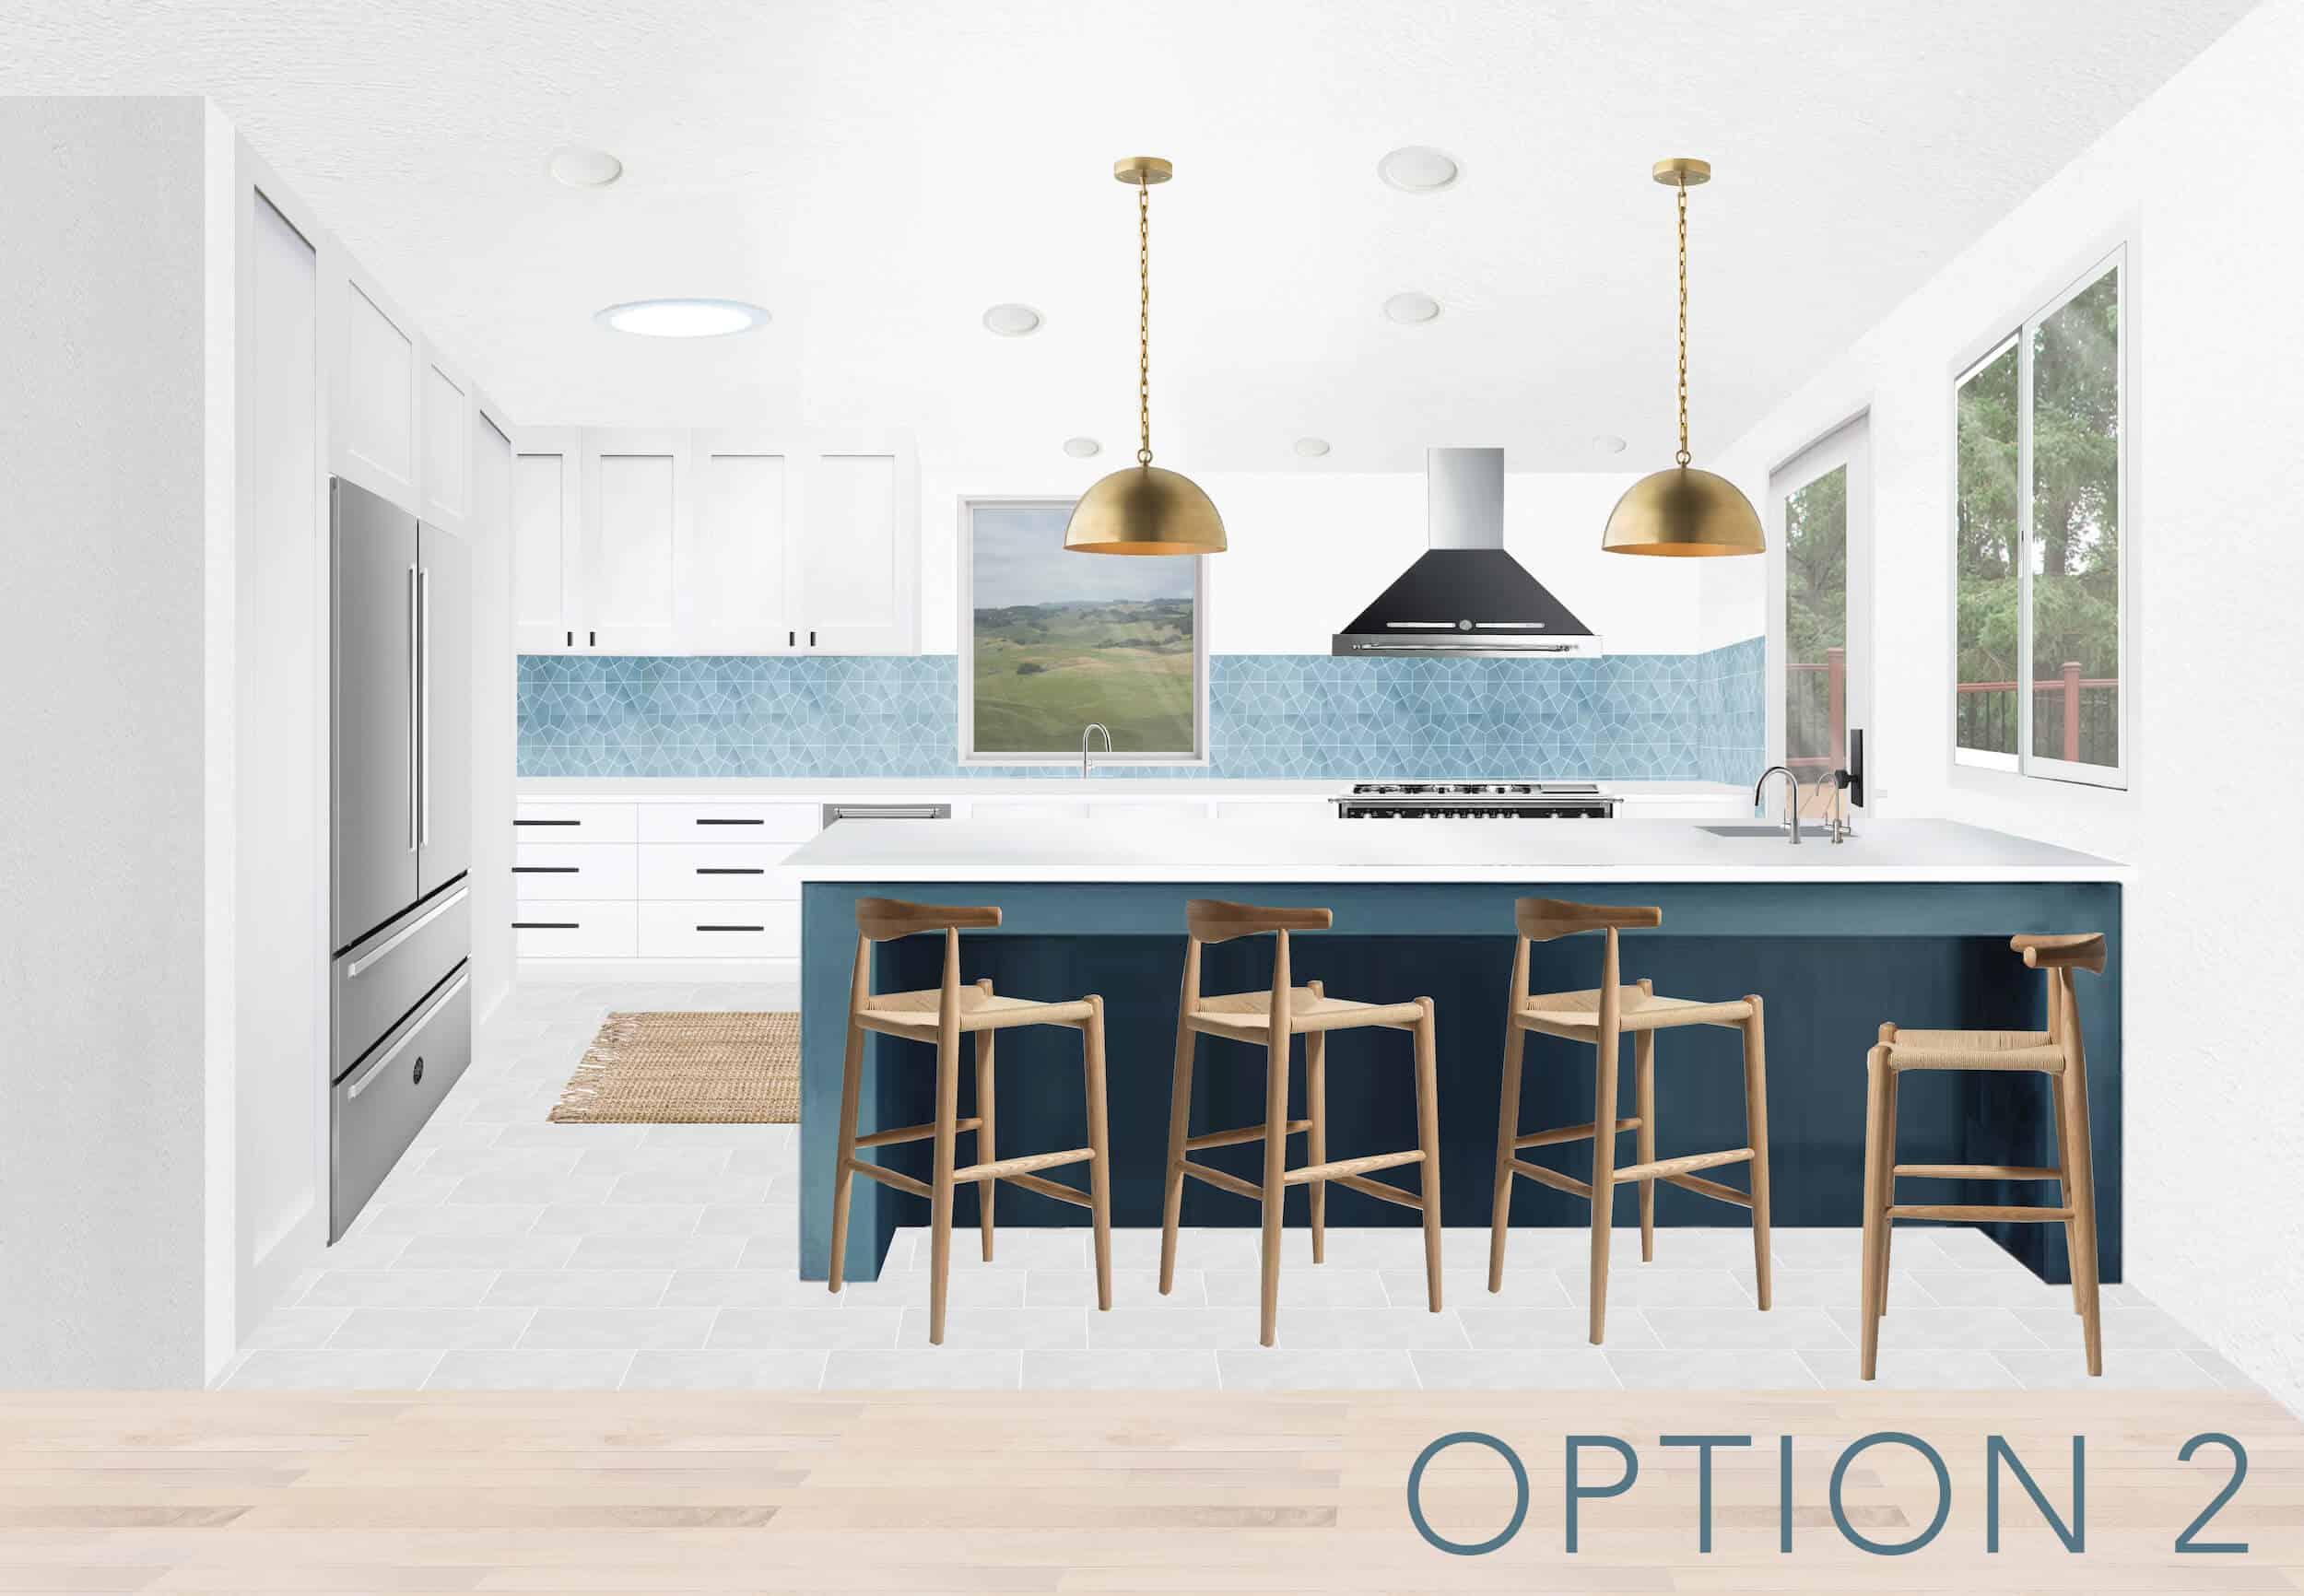 catherines-kitchen-render-option-2-text